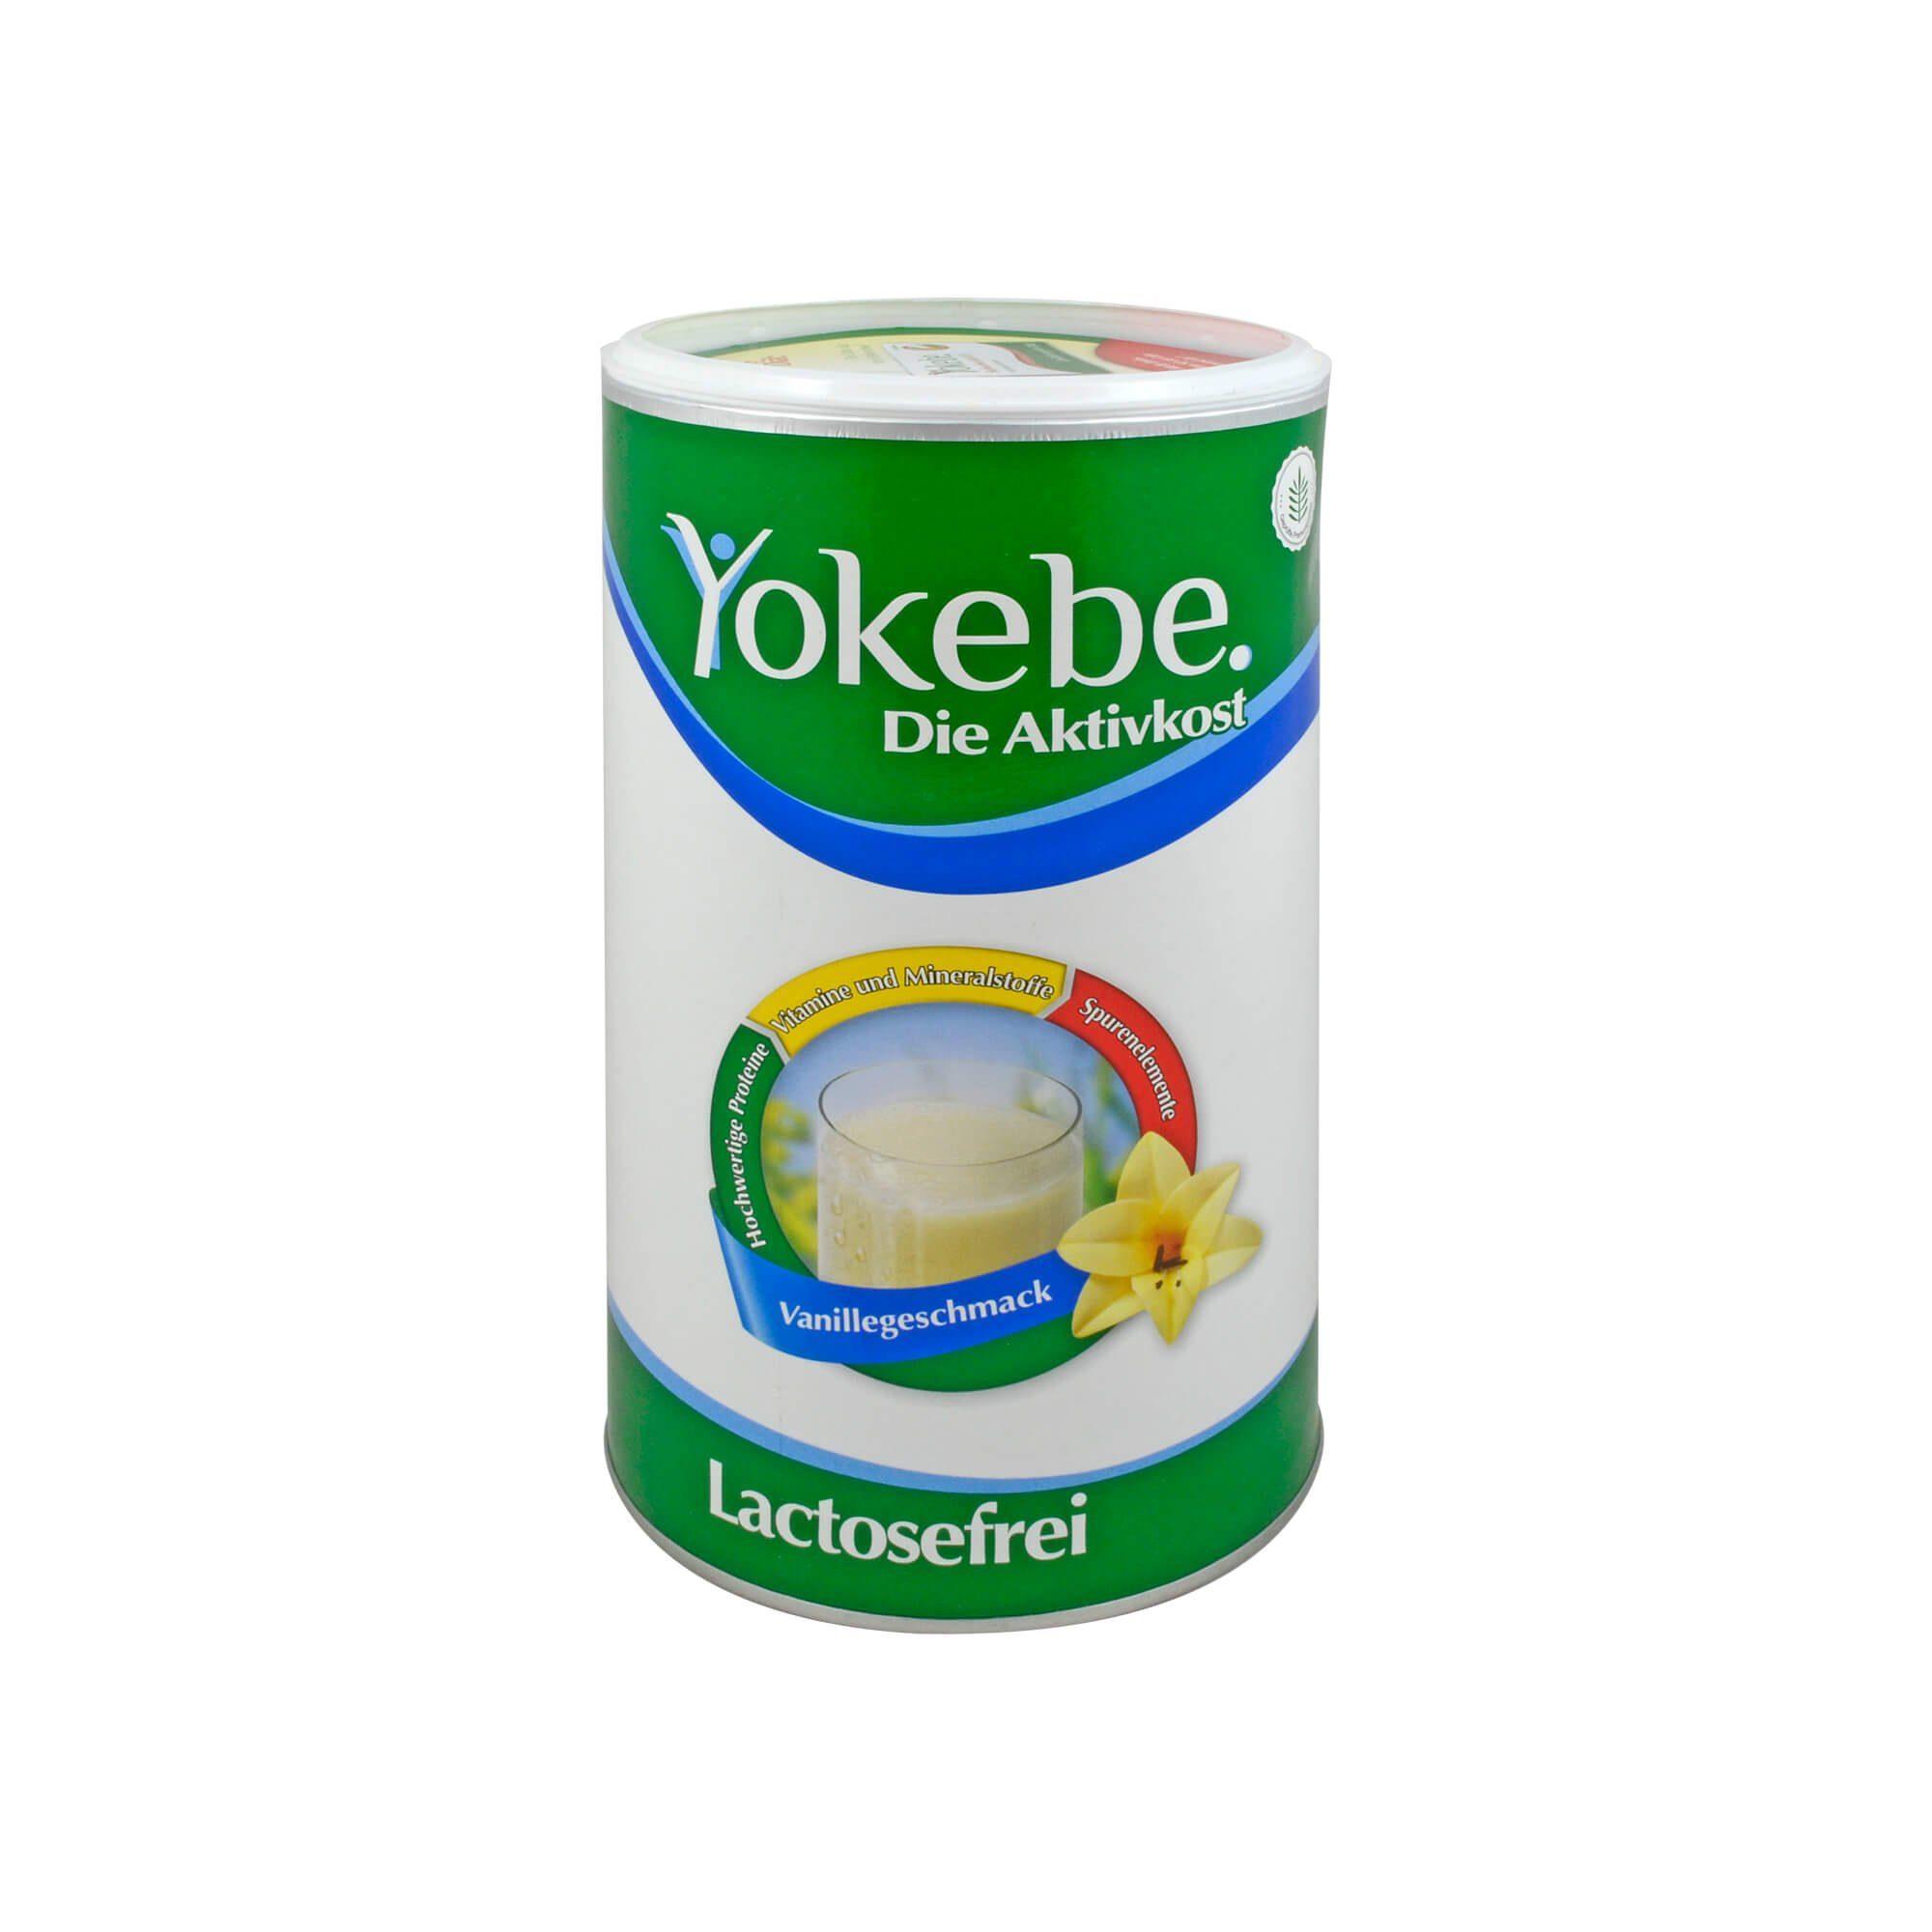 Yokebe Lactosefrei Vanille, 500 g